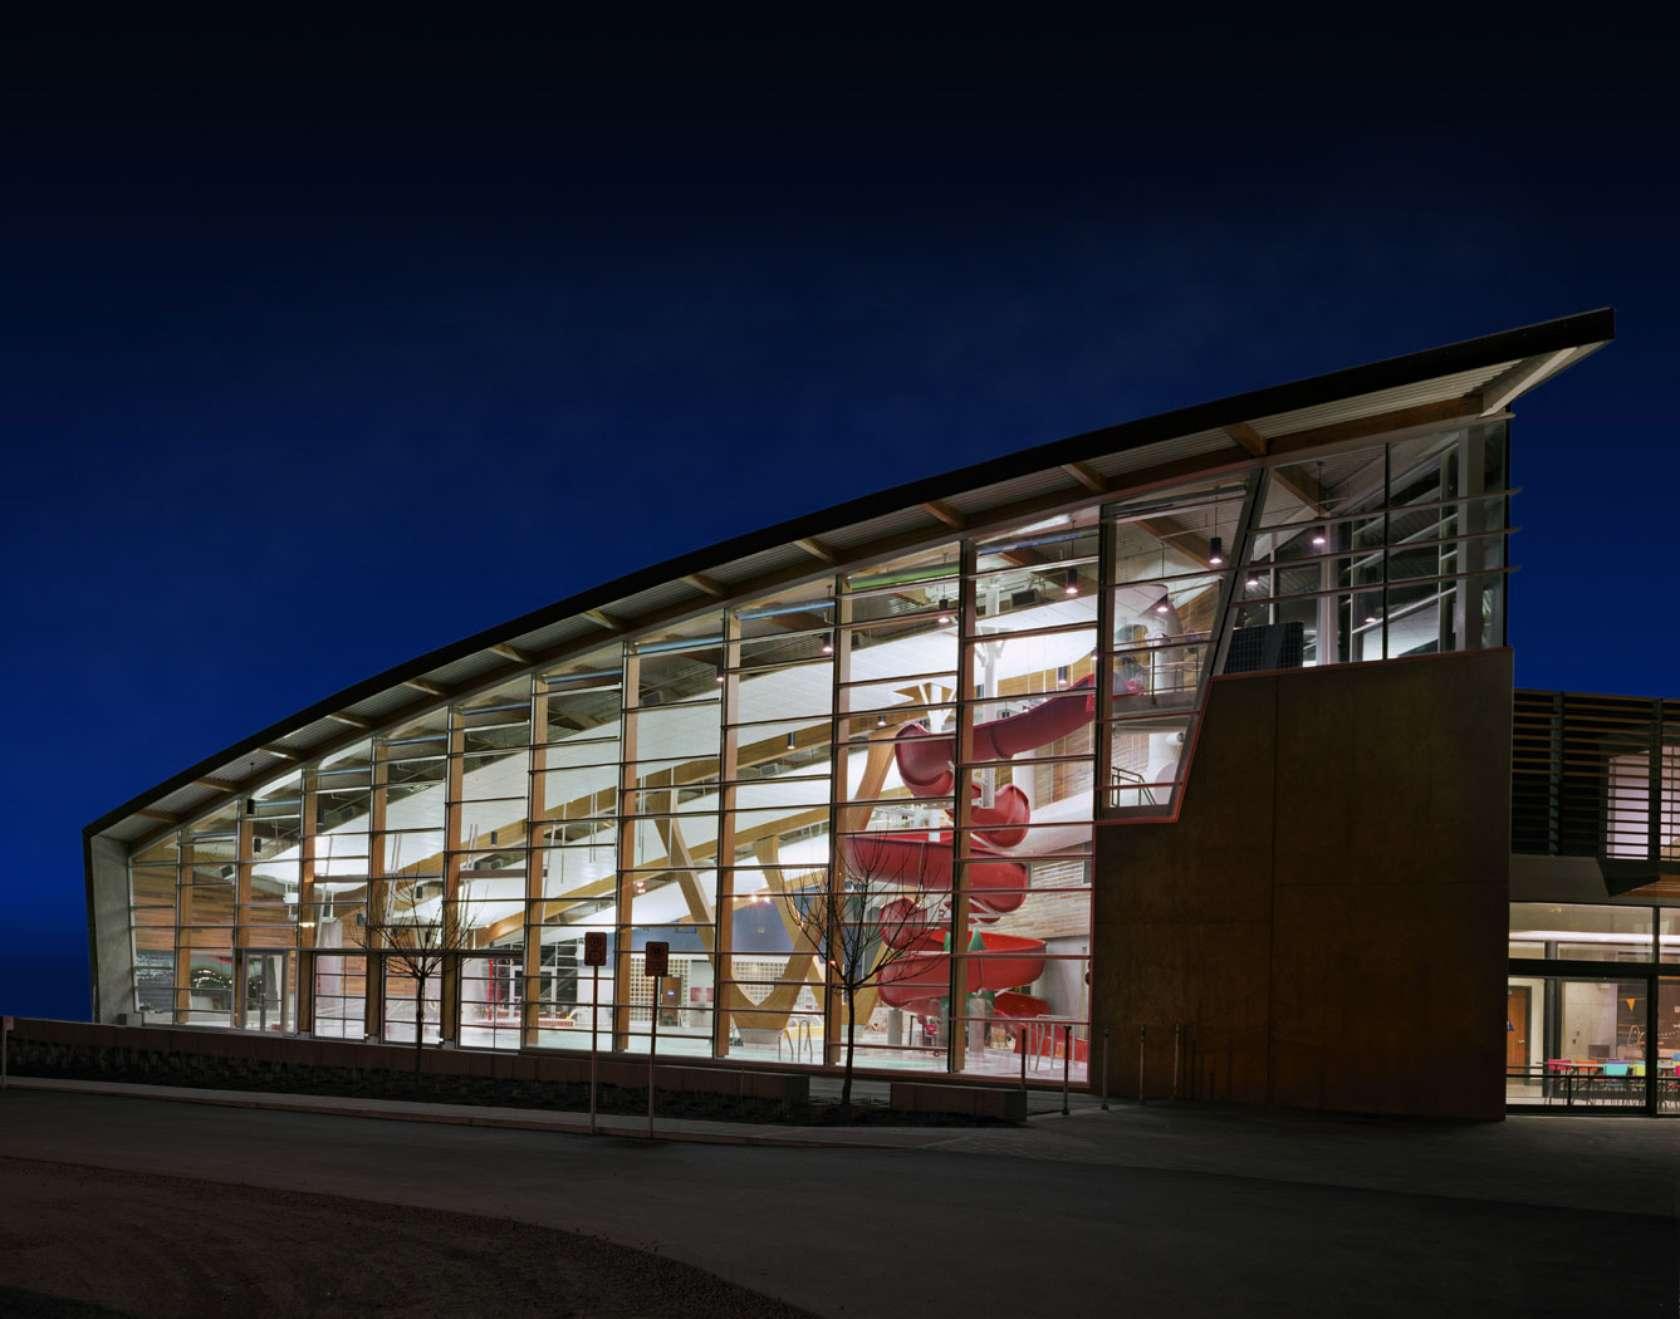 Hcma architecture design architizer for Pool design vancouver